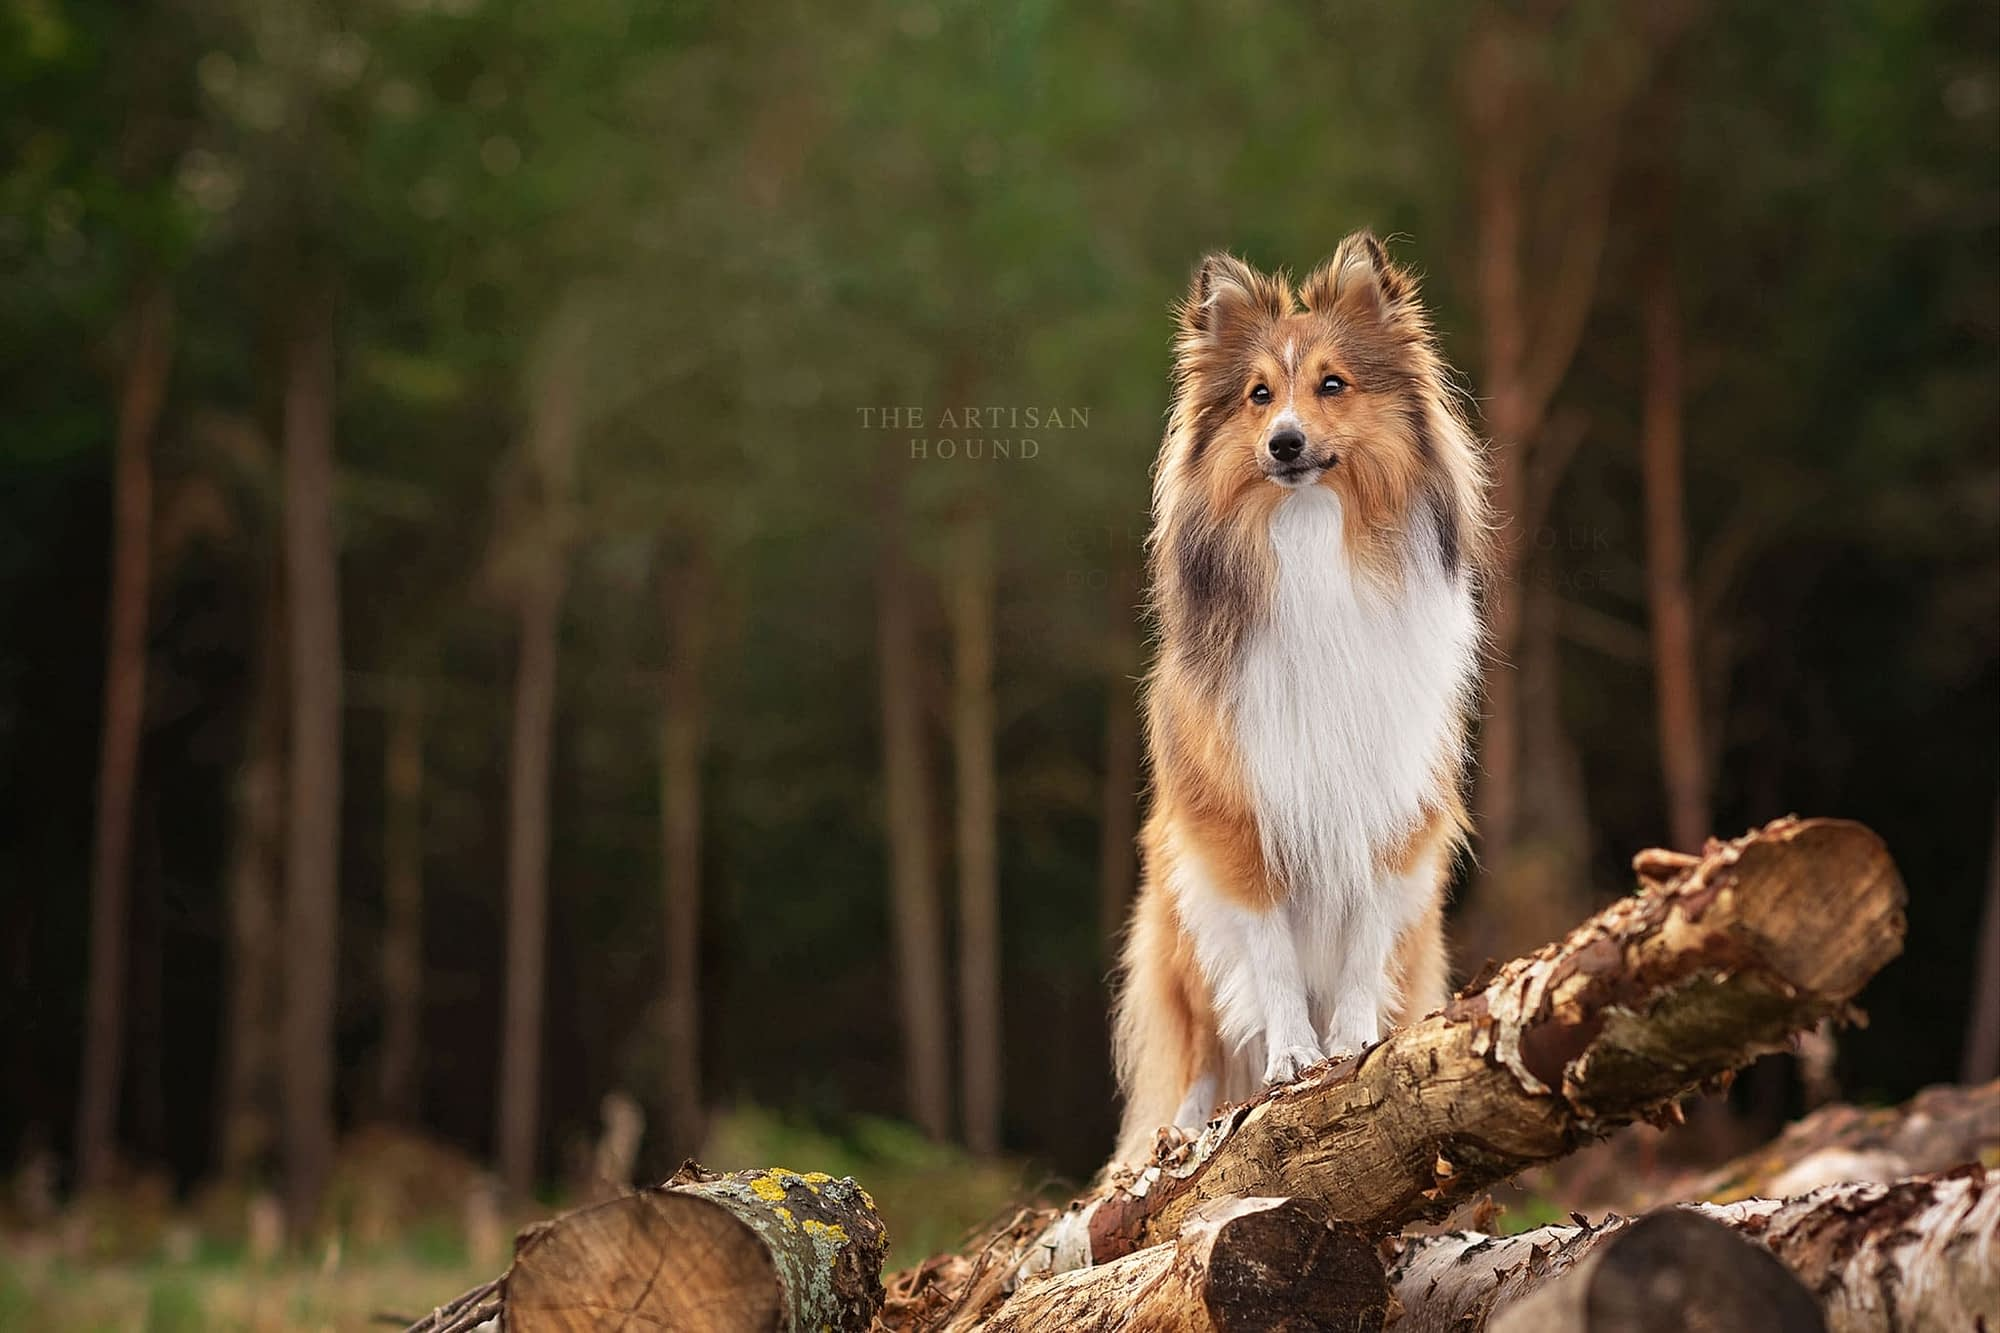 Shetland Sheepdog standing on pile of logs in Northampton woodland